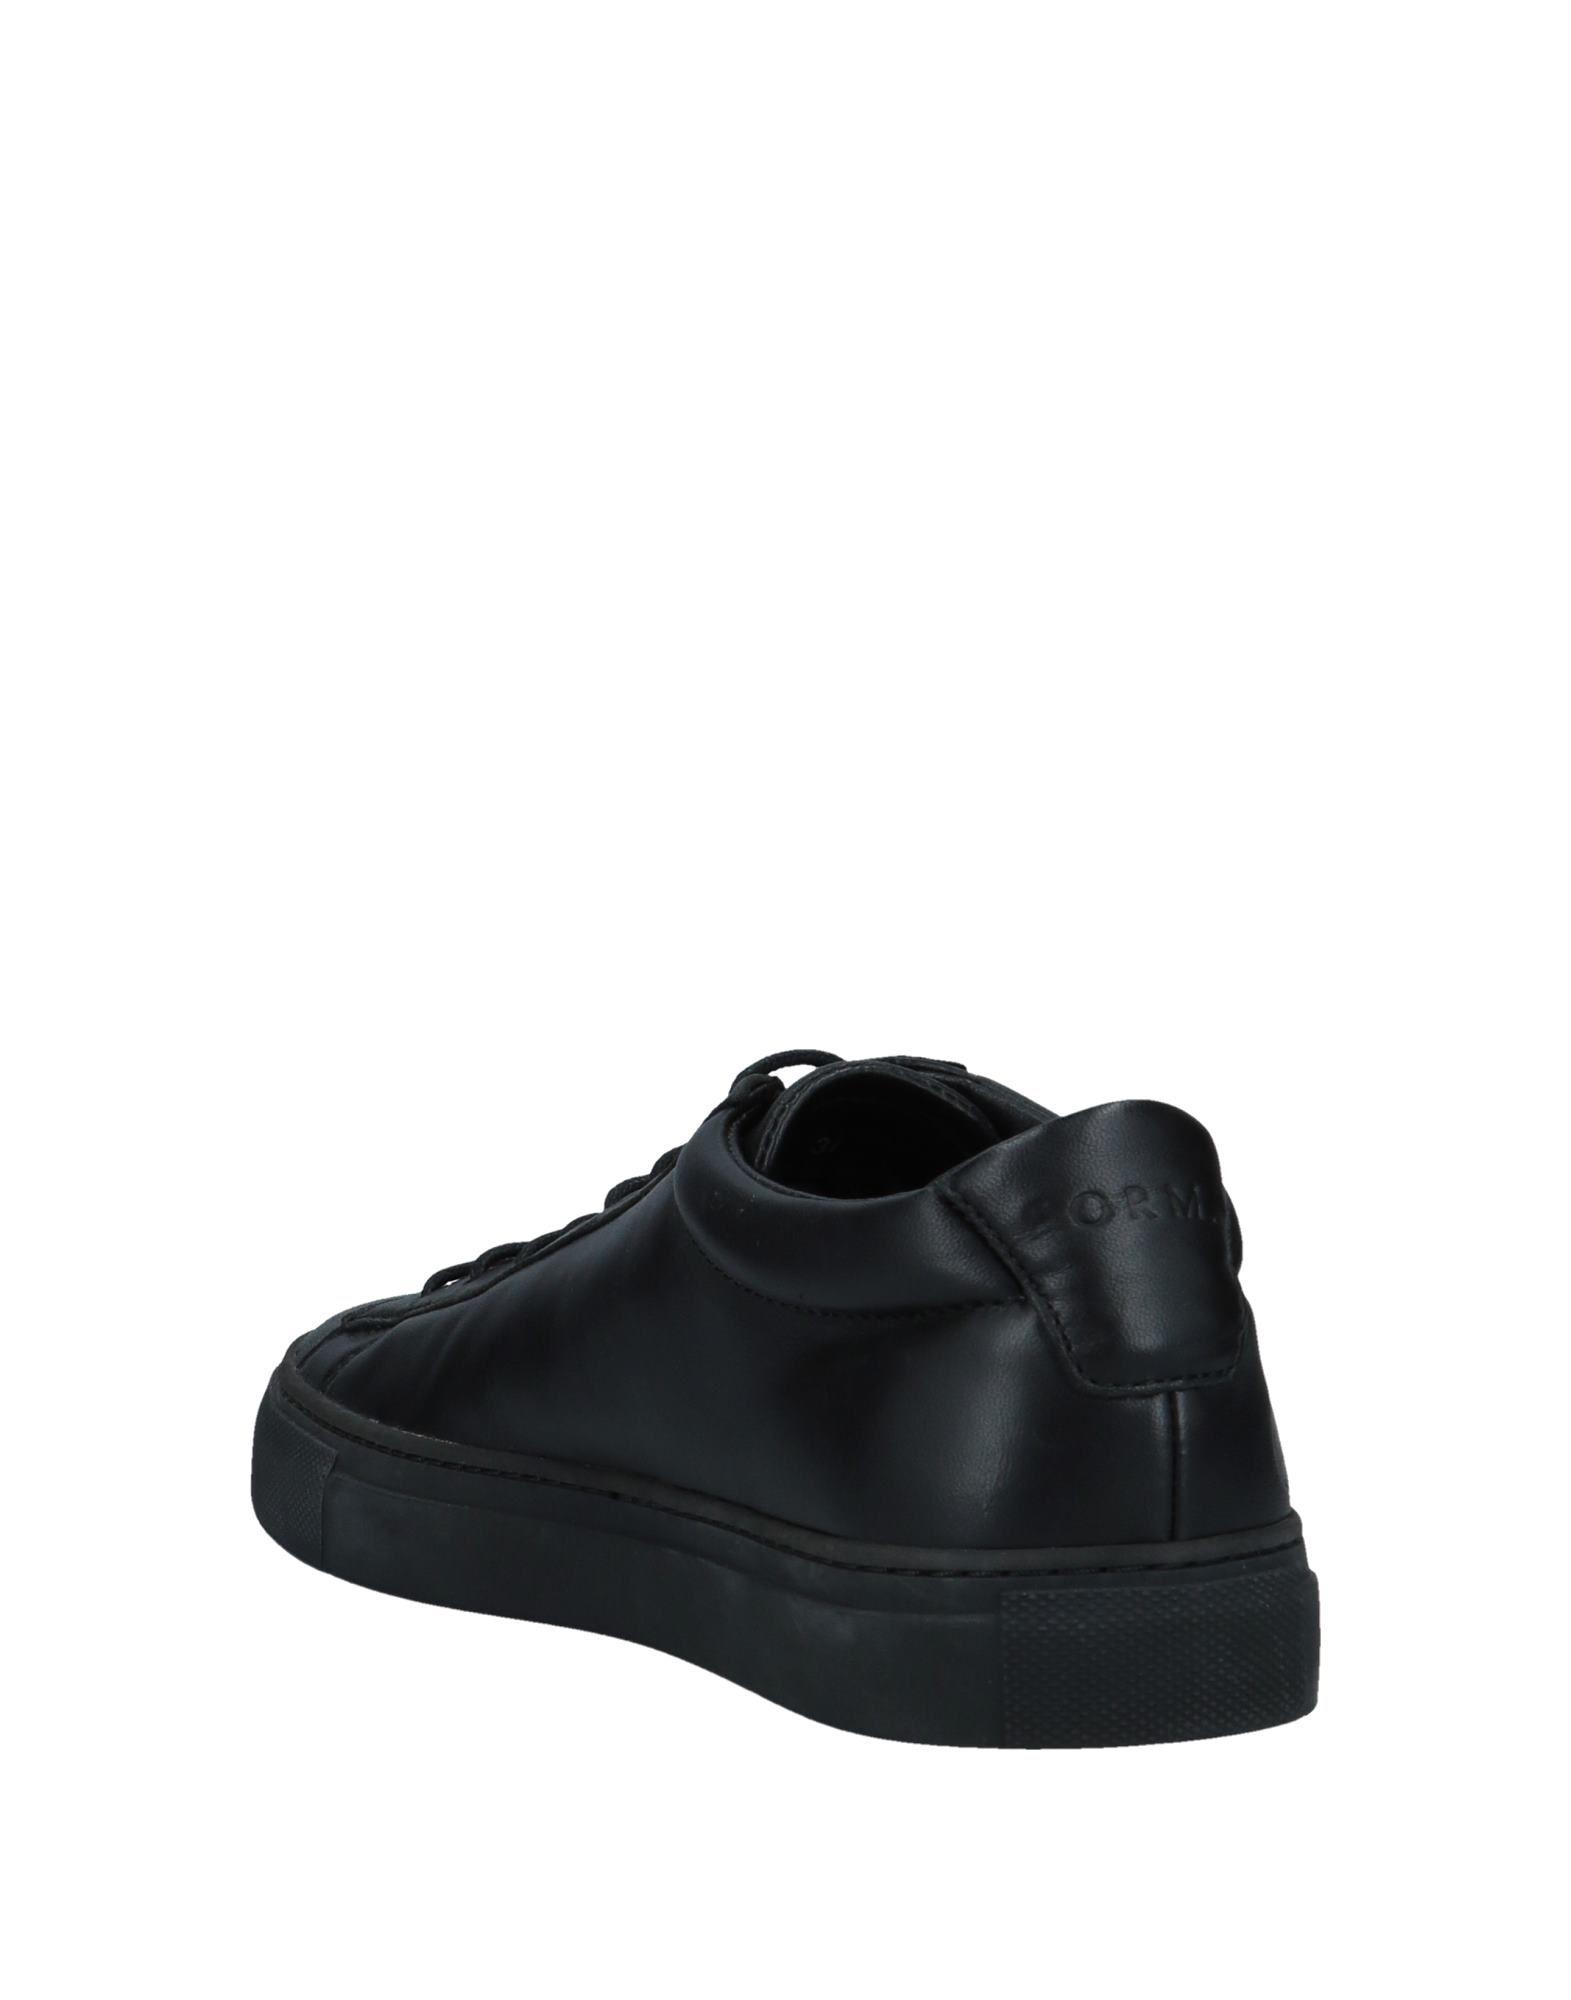 Primaforma Sneakers Damen  11548649JJ Schuhe Gute Qualität beliebte Schuhe 11548649JJ 508492